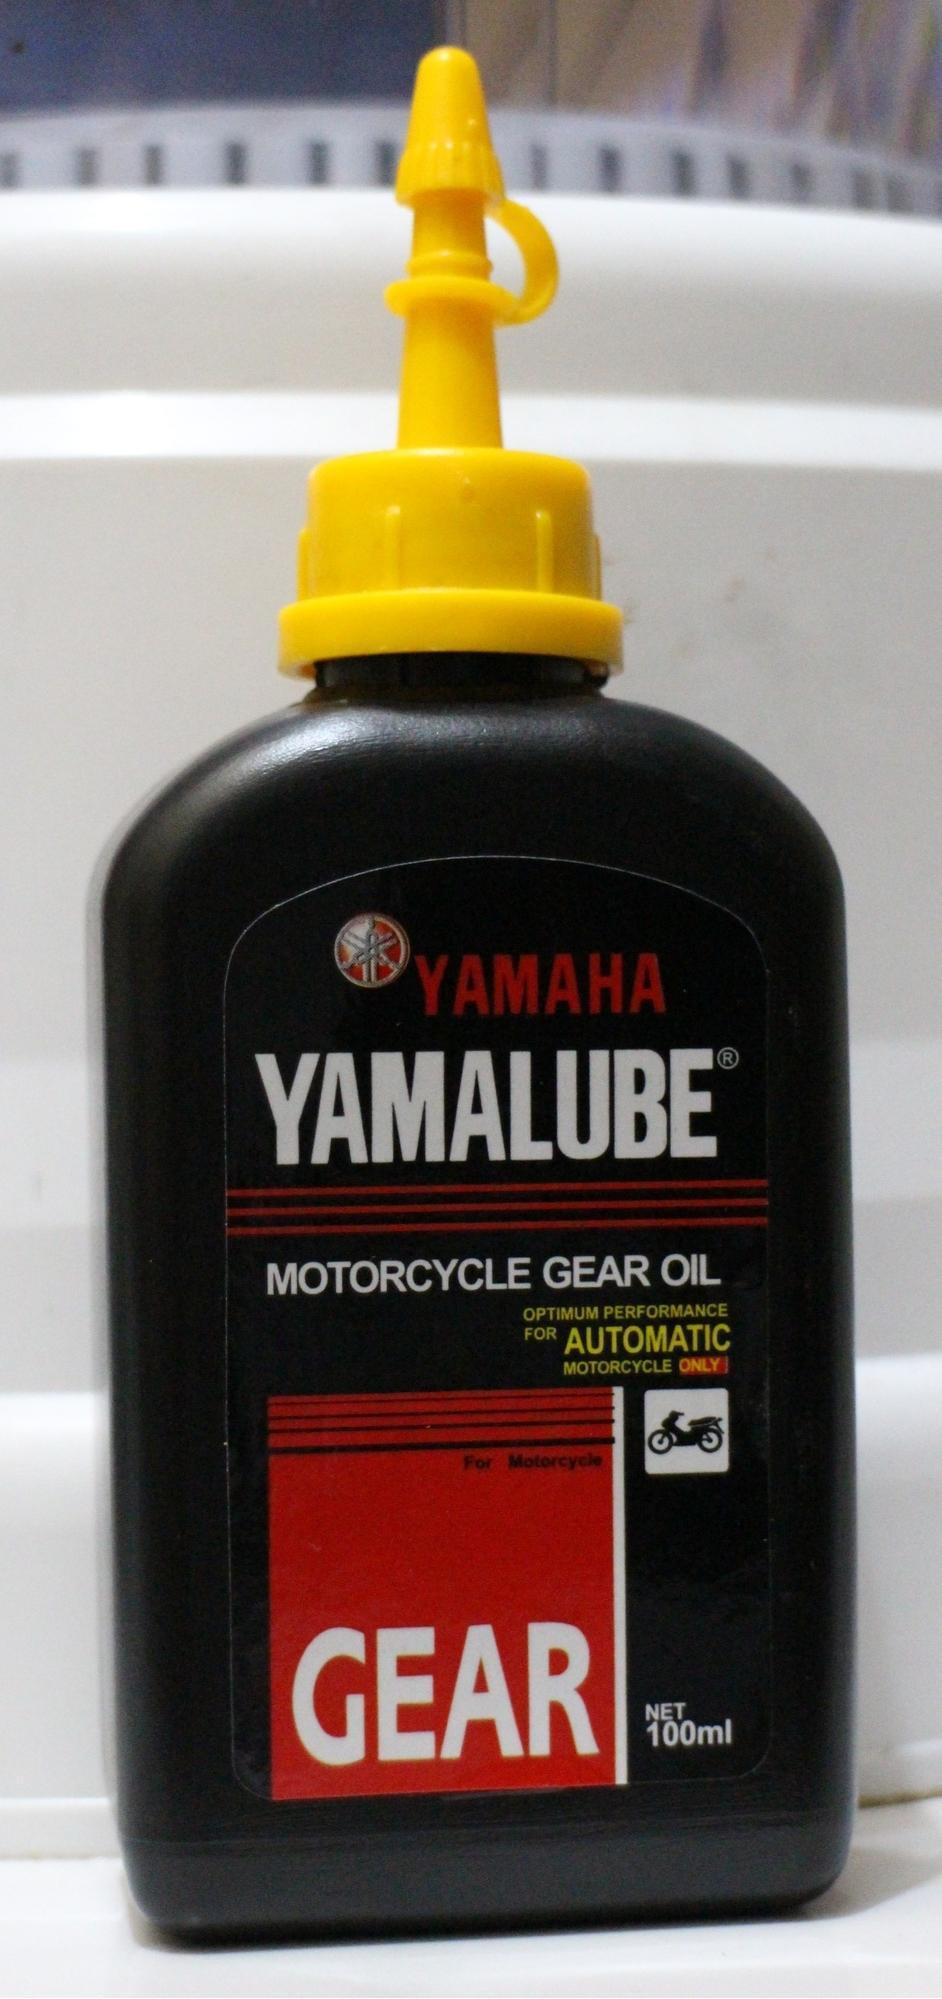 Yamaha Yamalube Gear Oil By Jca Motorshop.